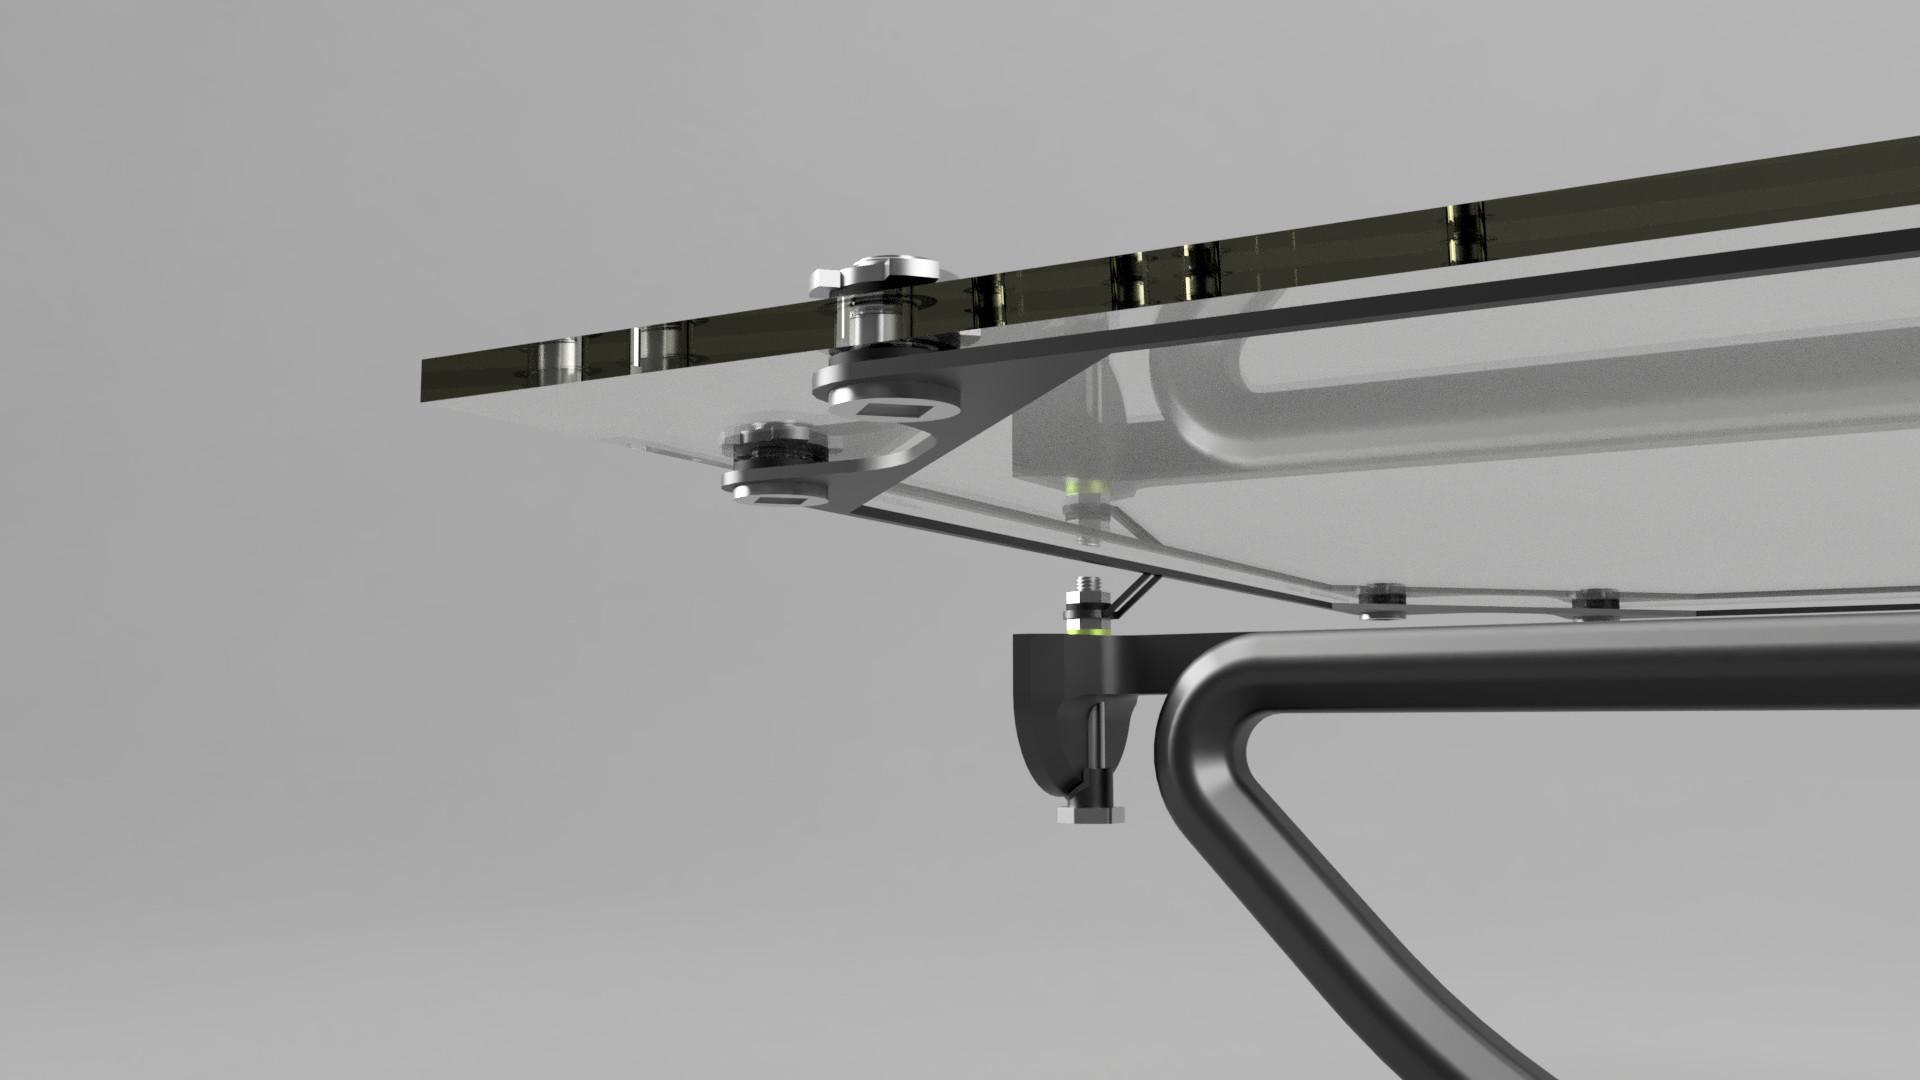 Northstat group truss idea request test 01 2017 dec 13 03 25 00pm 000 customizedview12056240273